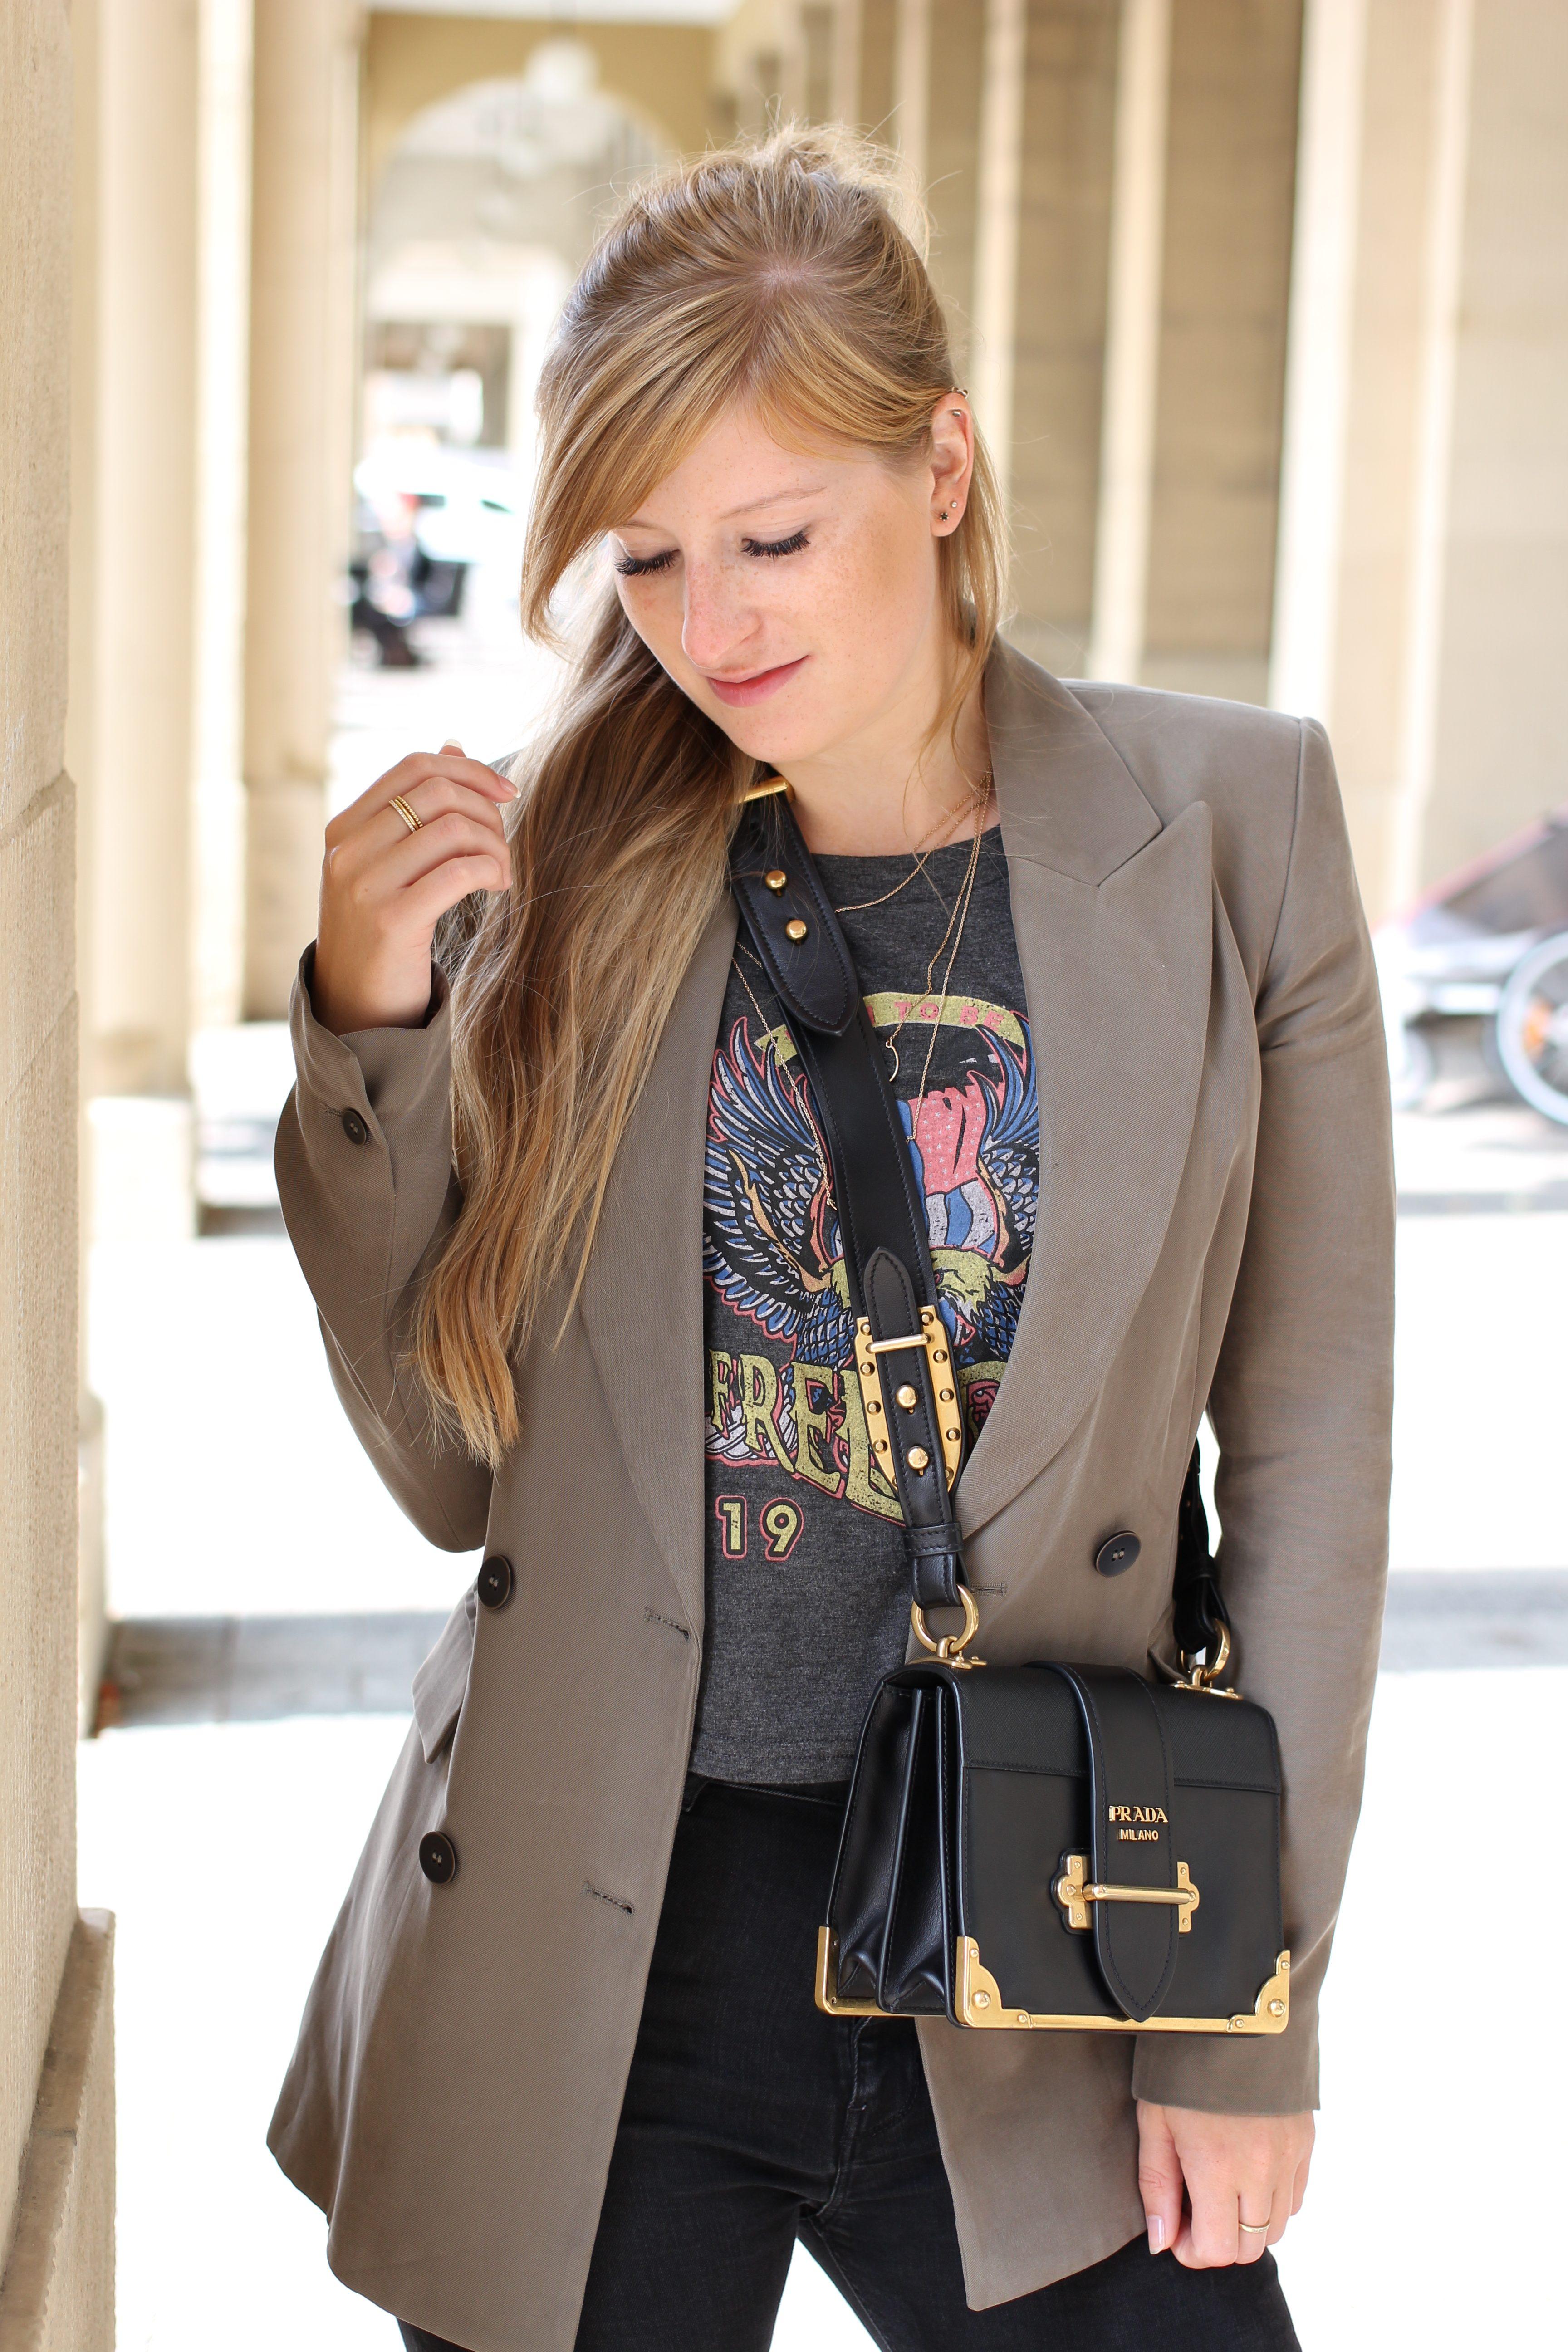 Highwaist Jeans Crop Top Print kombinieren Lieblings-Blazer Zara Blazer Navy Grün Prada Cahier Bag Frühlingslook Outfit Modeblog Karlsruhe 7